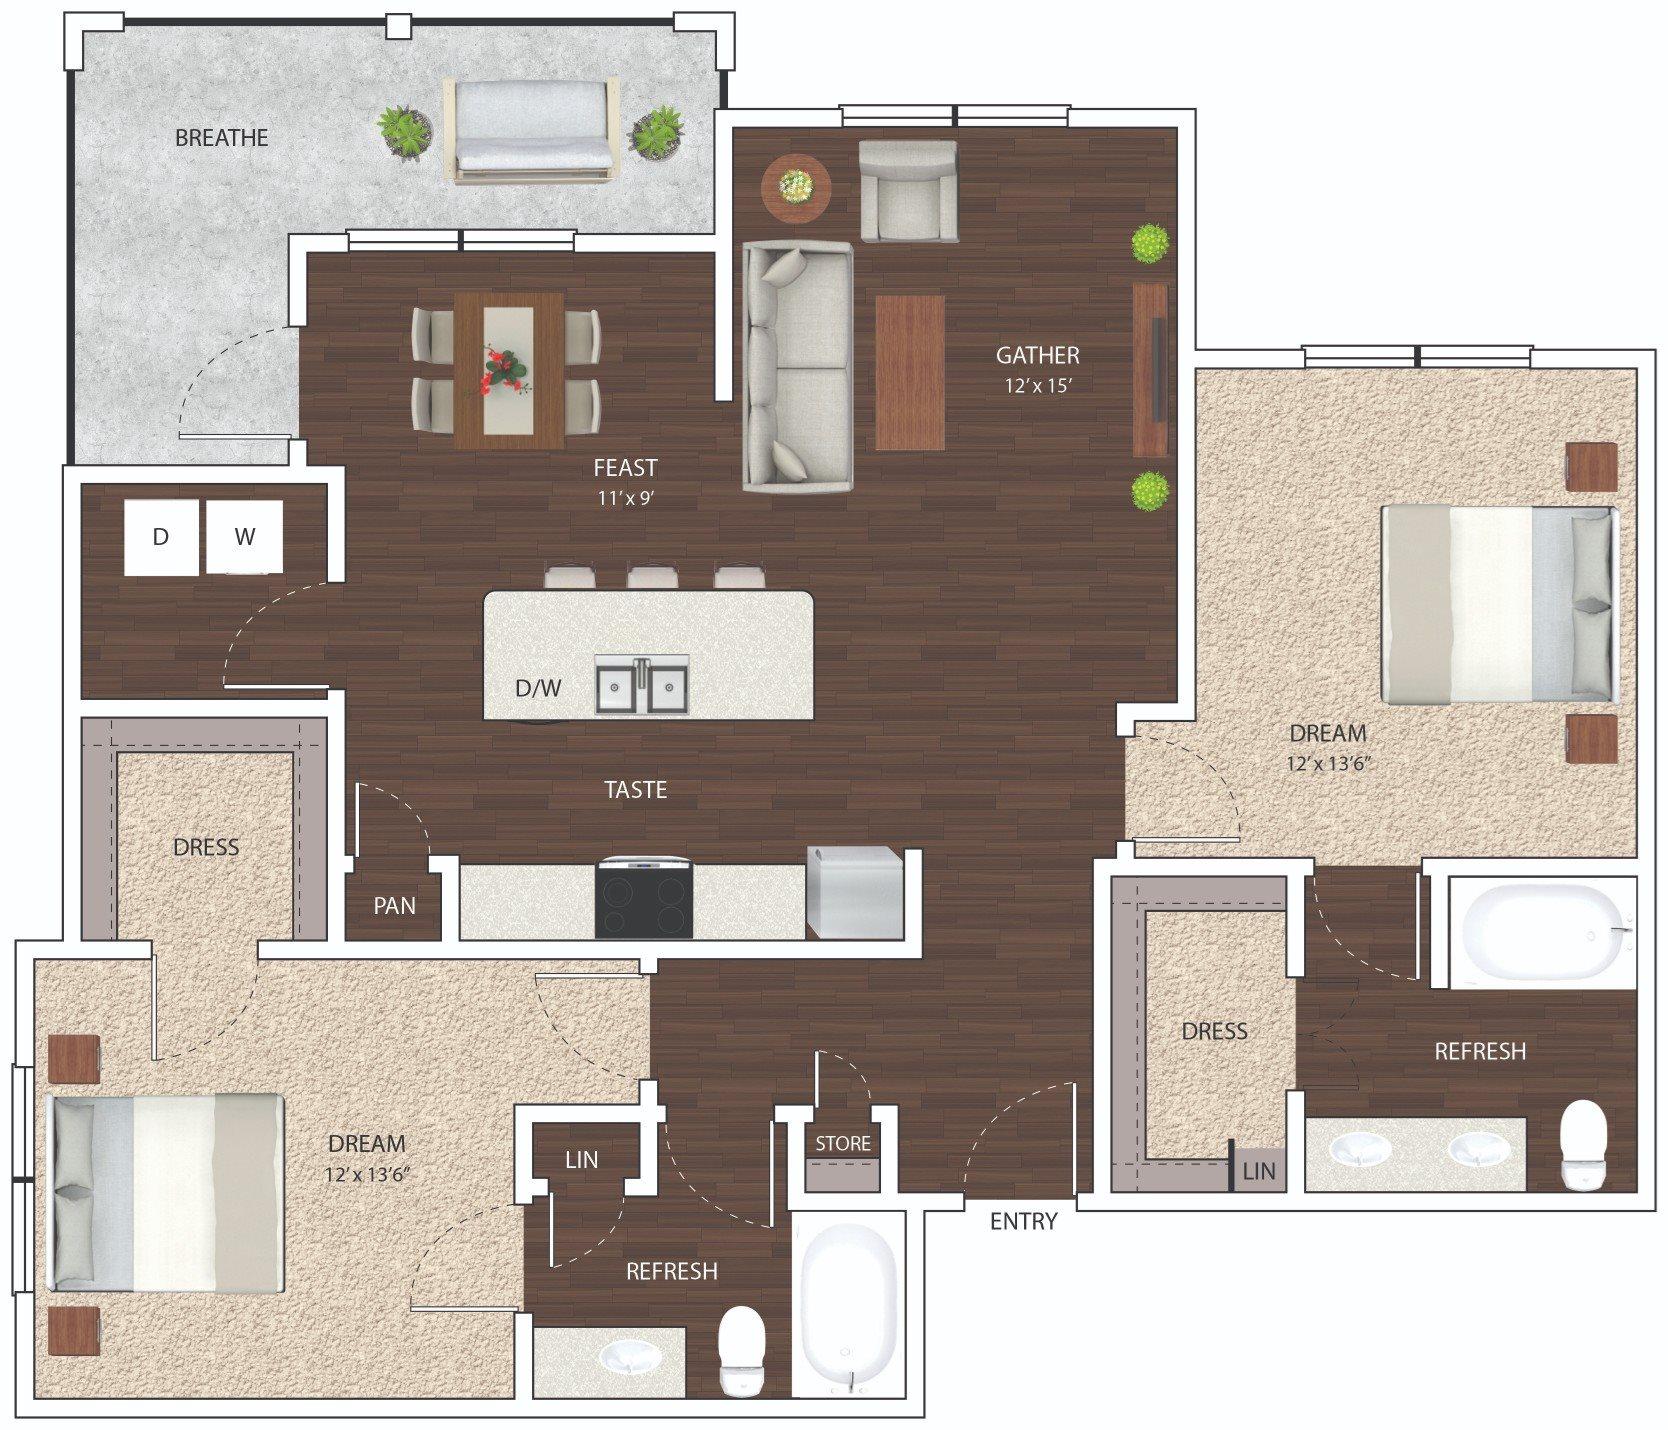 B3 - Phase I Floor Plan 11